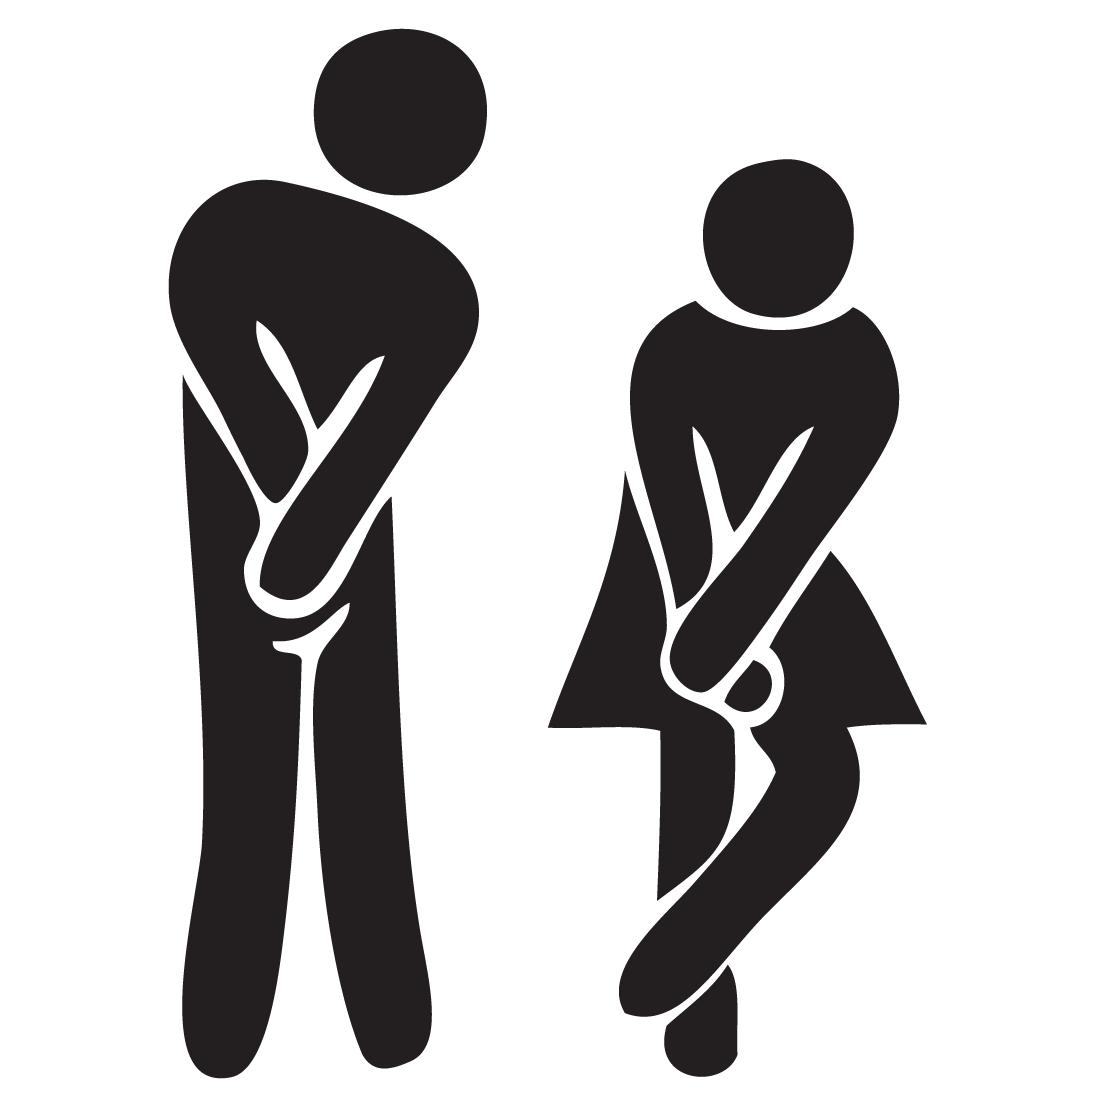 Adhesivo de vinilo toilet wc se alizaci n ba o para bares for Vinilos para bares